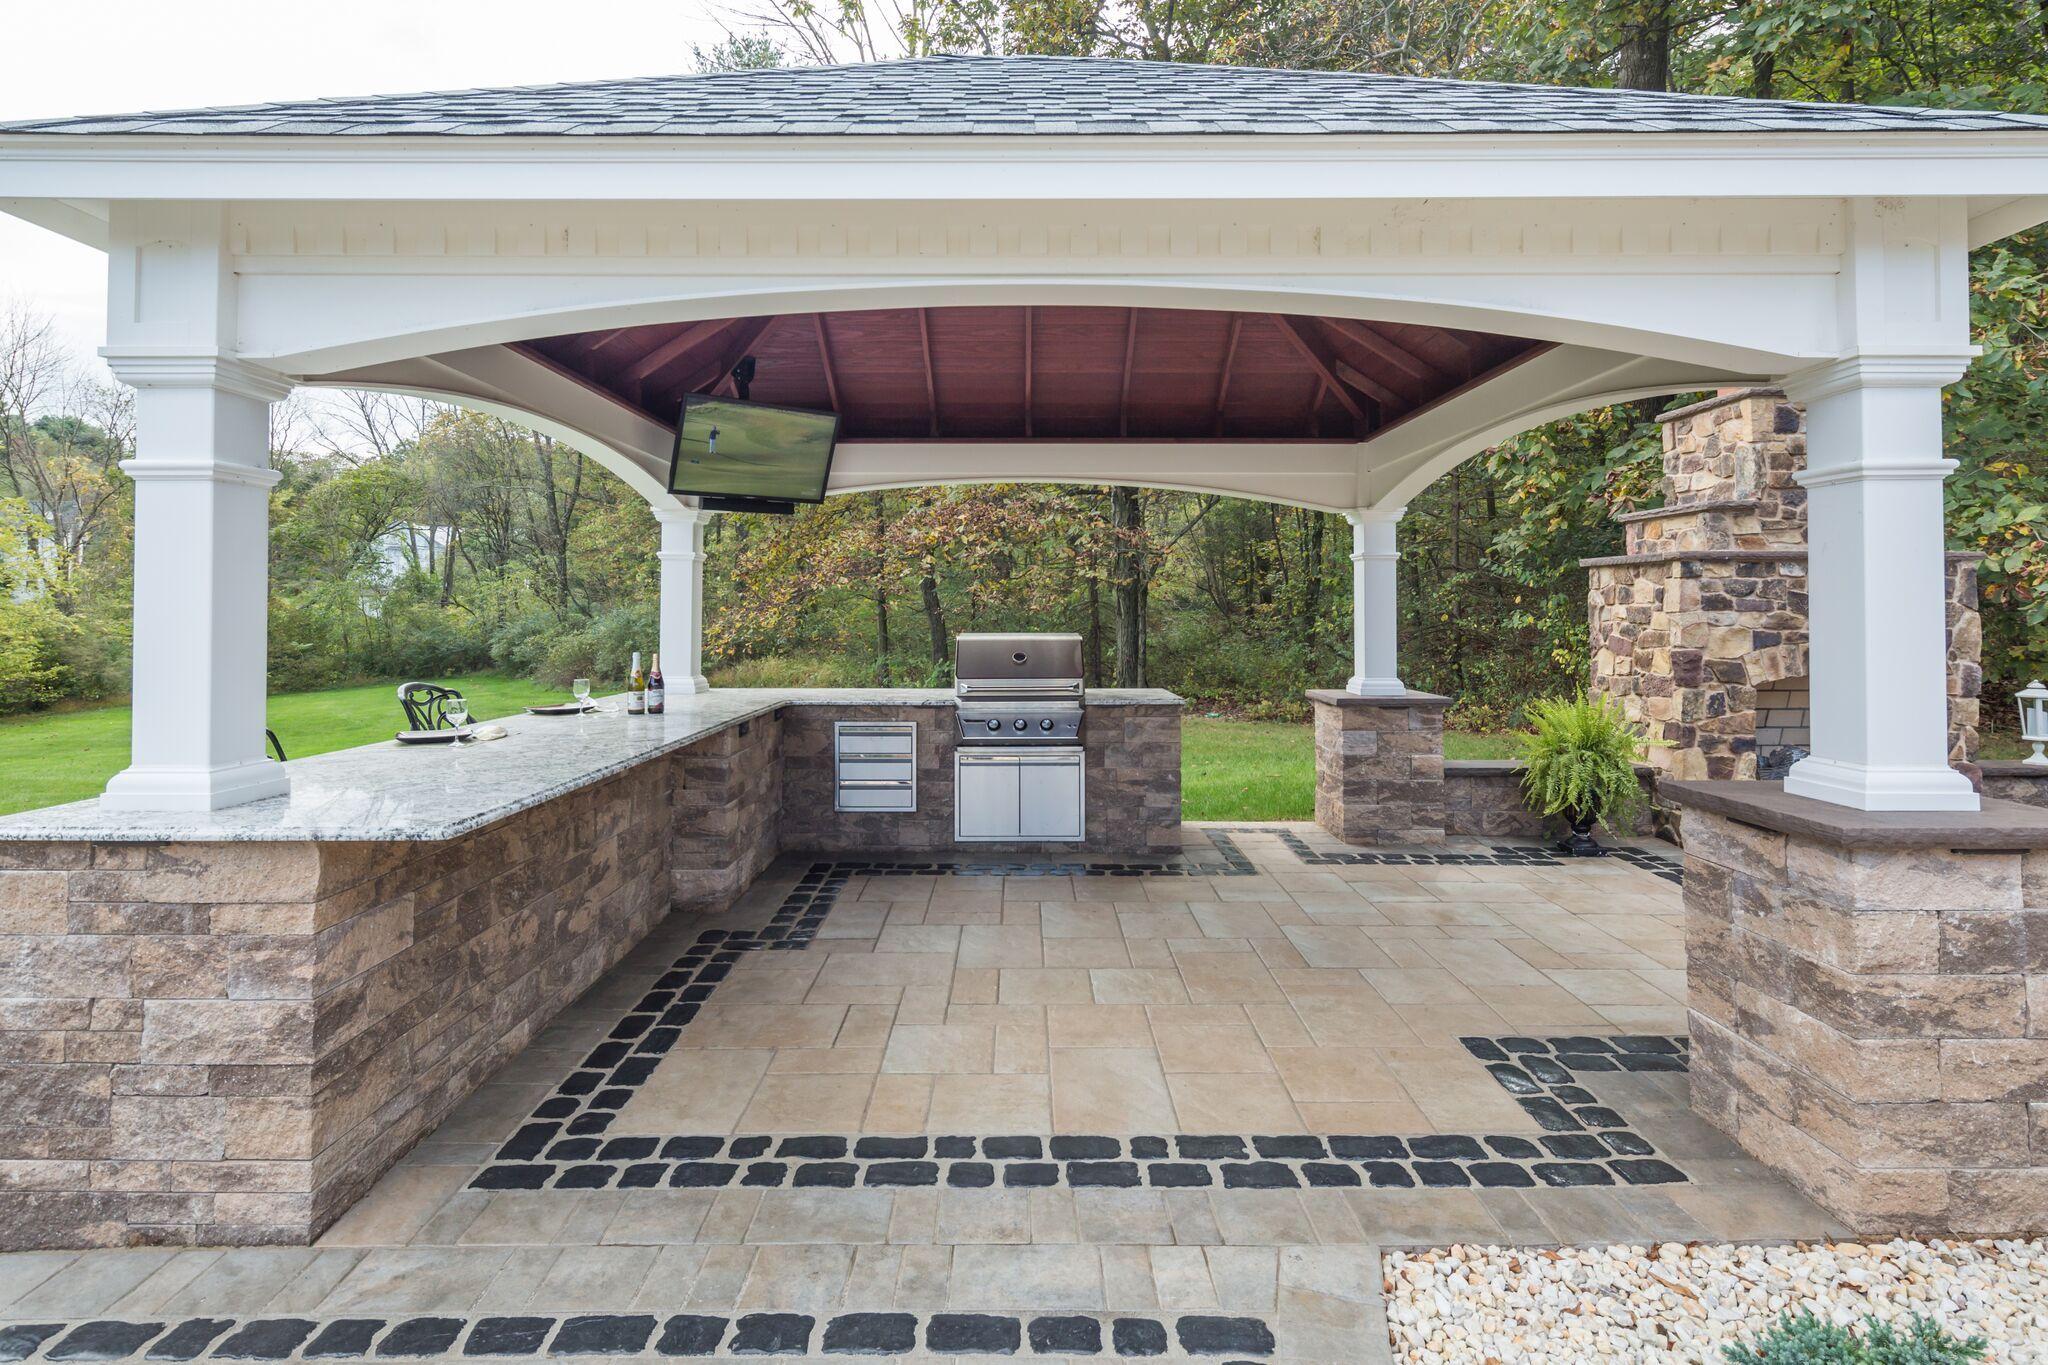 Custom Built Pavilions For Your Backyard Outdoor Kitchen Design Outdoor Kitchen Design Layout Outdoor Kitchen